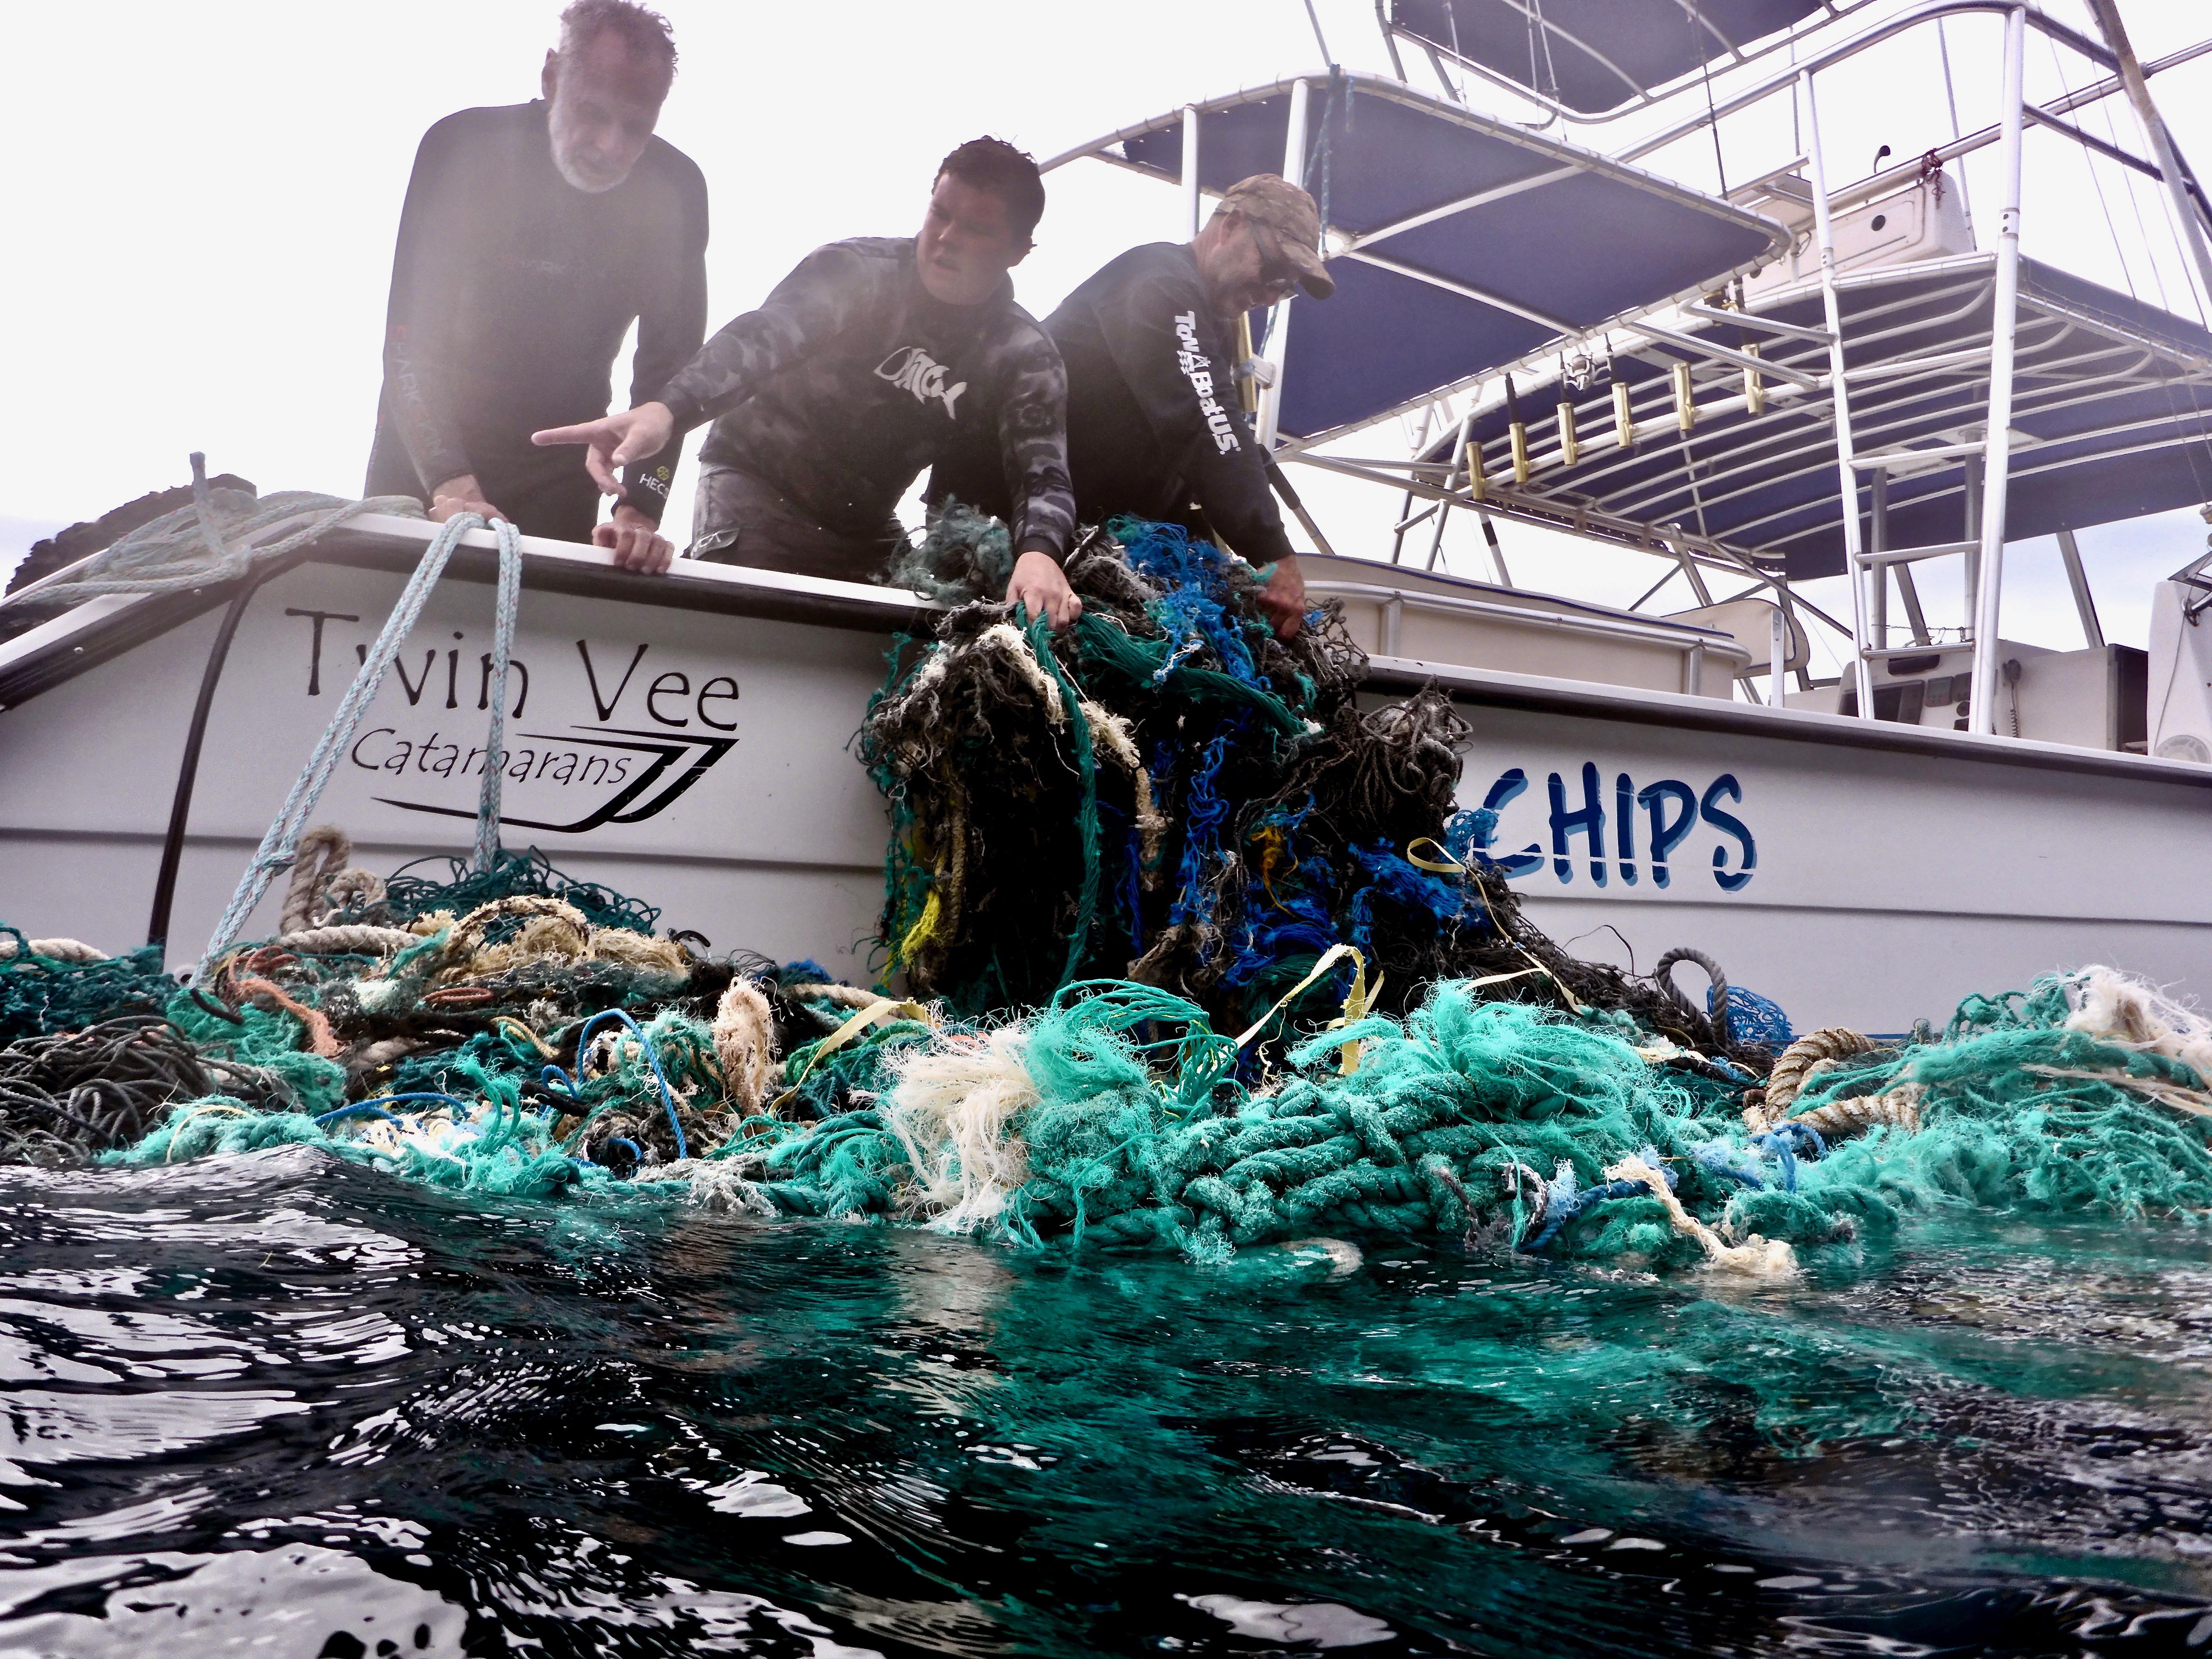 Sven Hauling Nets On Boat.jpg